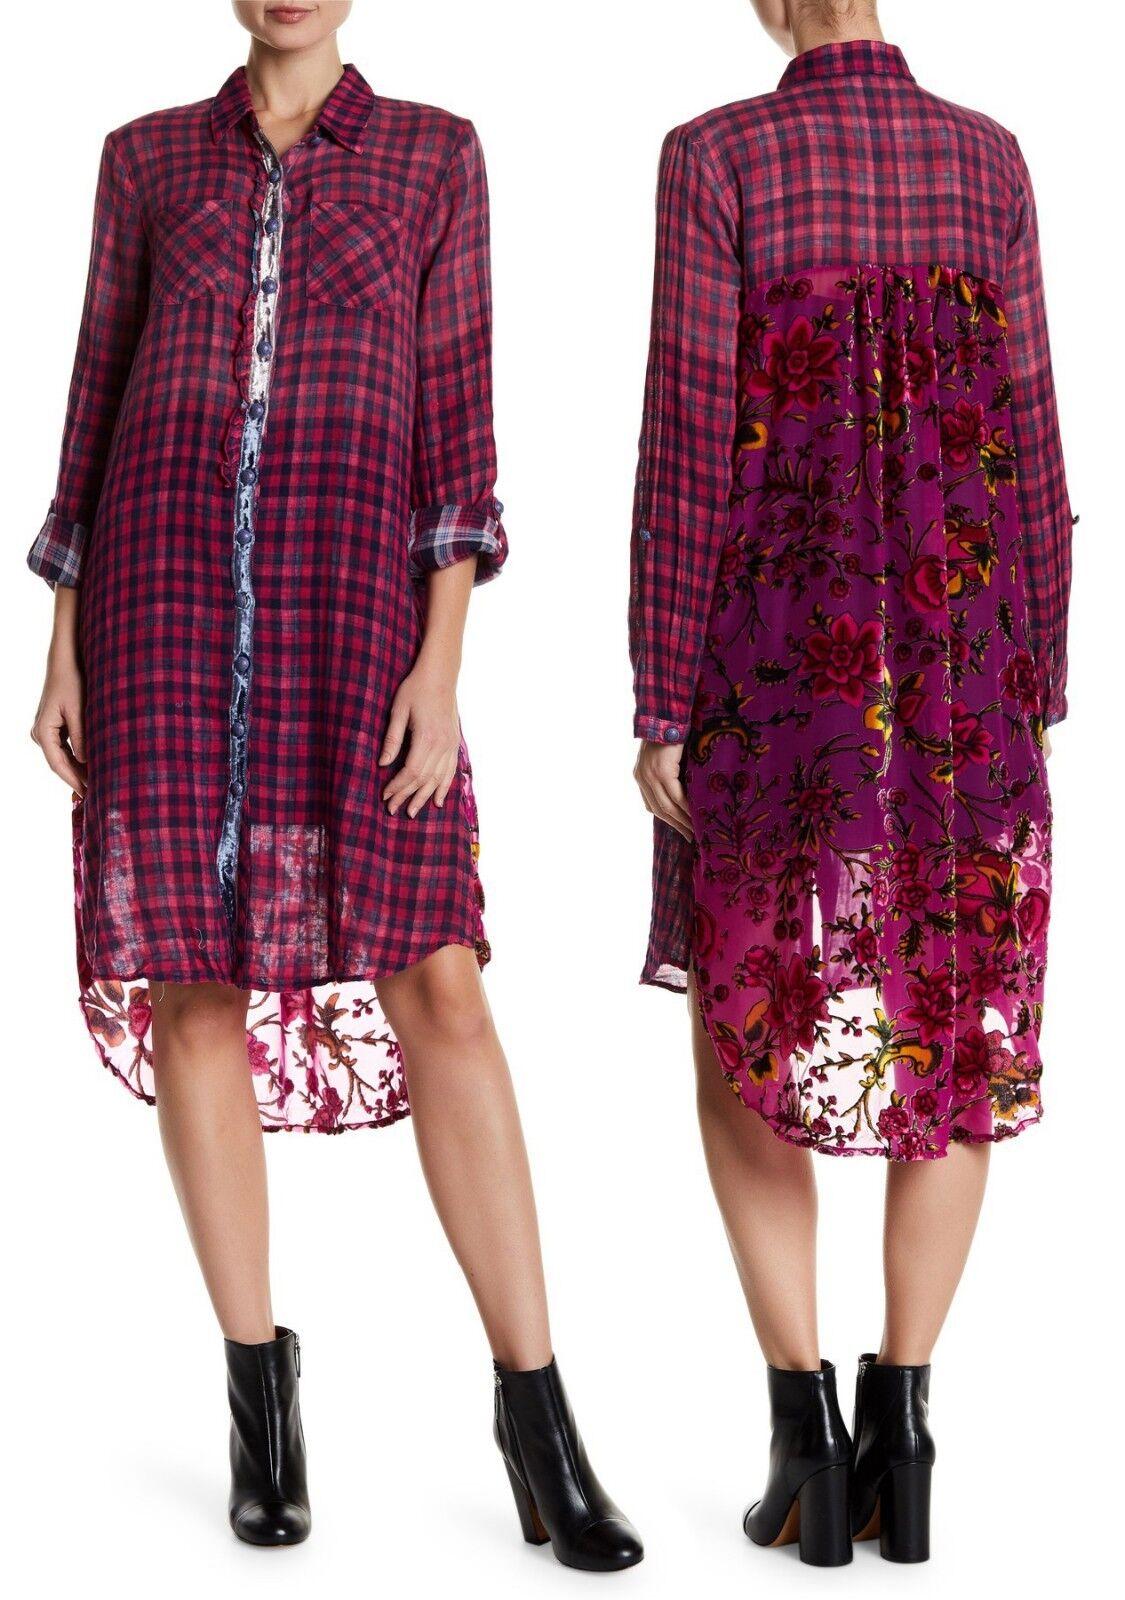 NWT ARATTA Extra Long Plaid Floral Tunic Button Down Shirt Cotton Top Sz Small S